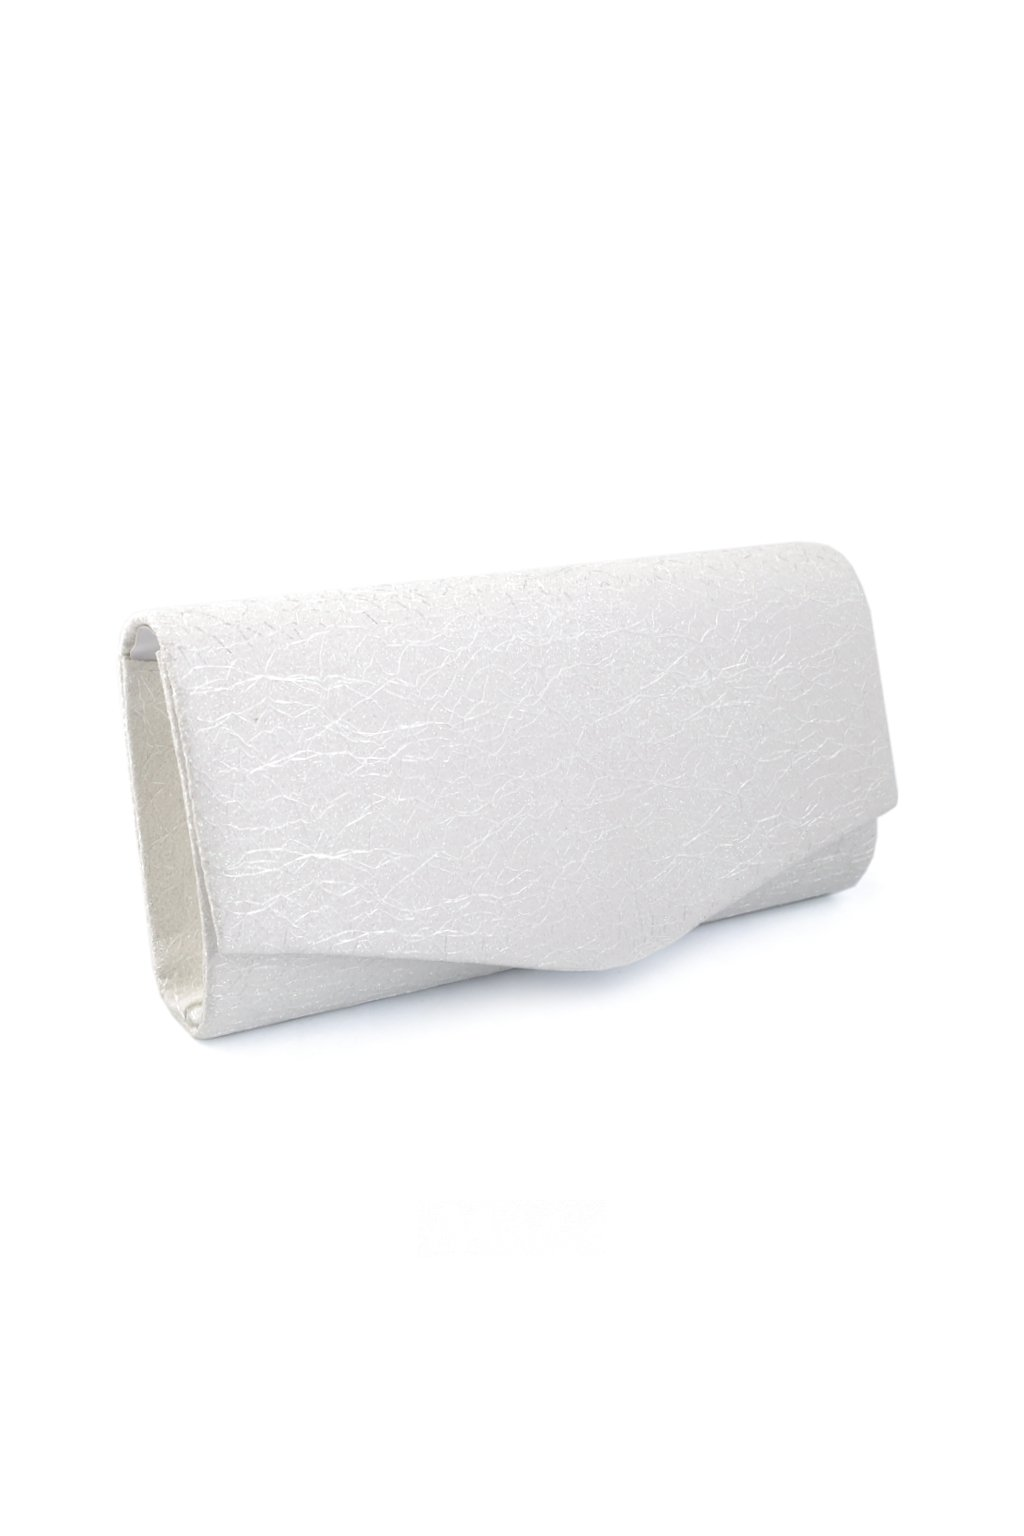 Psaníčko kabelka bílá